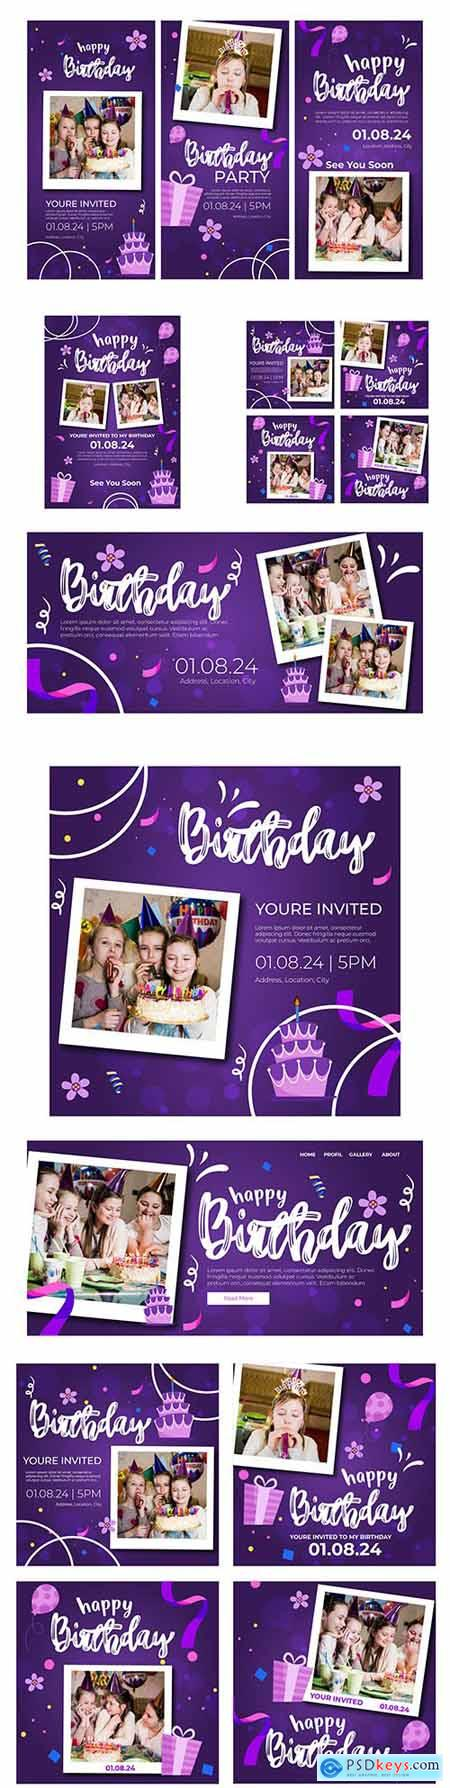 Childrens birthday banner and instagram posts